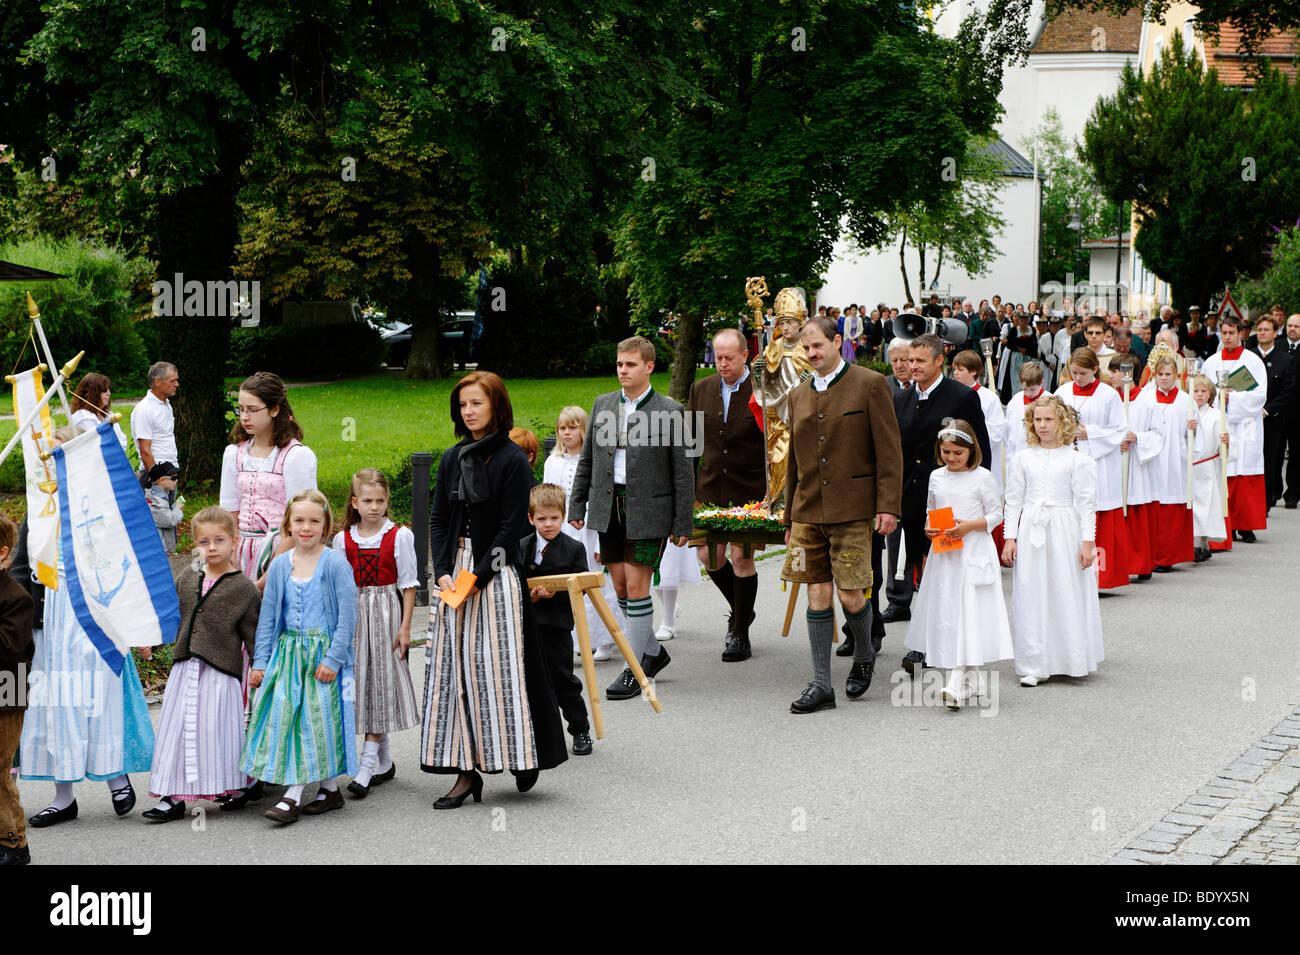 Kiliansfest, fest des St. Kilian, Bad Heilbrunn, Loisachtal, Tölz Region, Oberbayern, Deutschland, Europa Stockbild